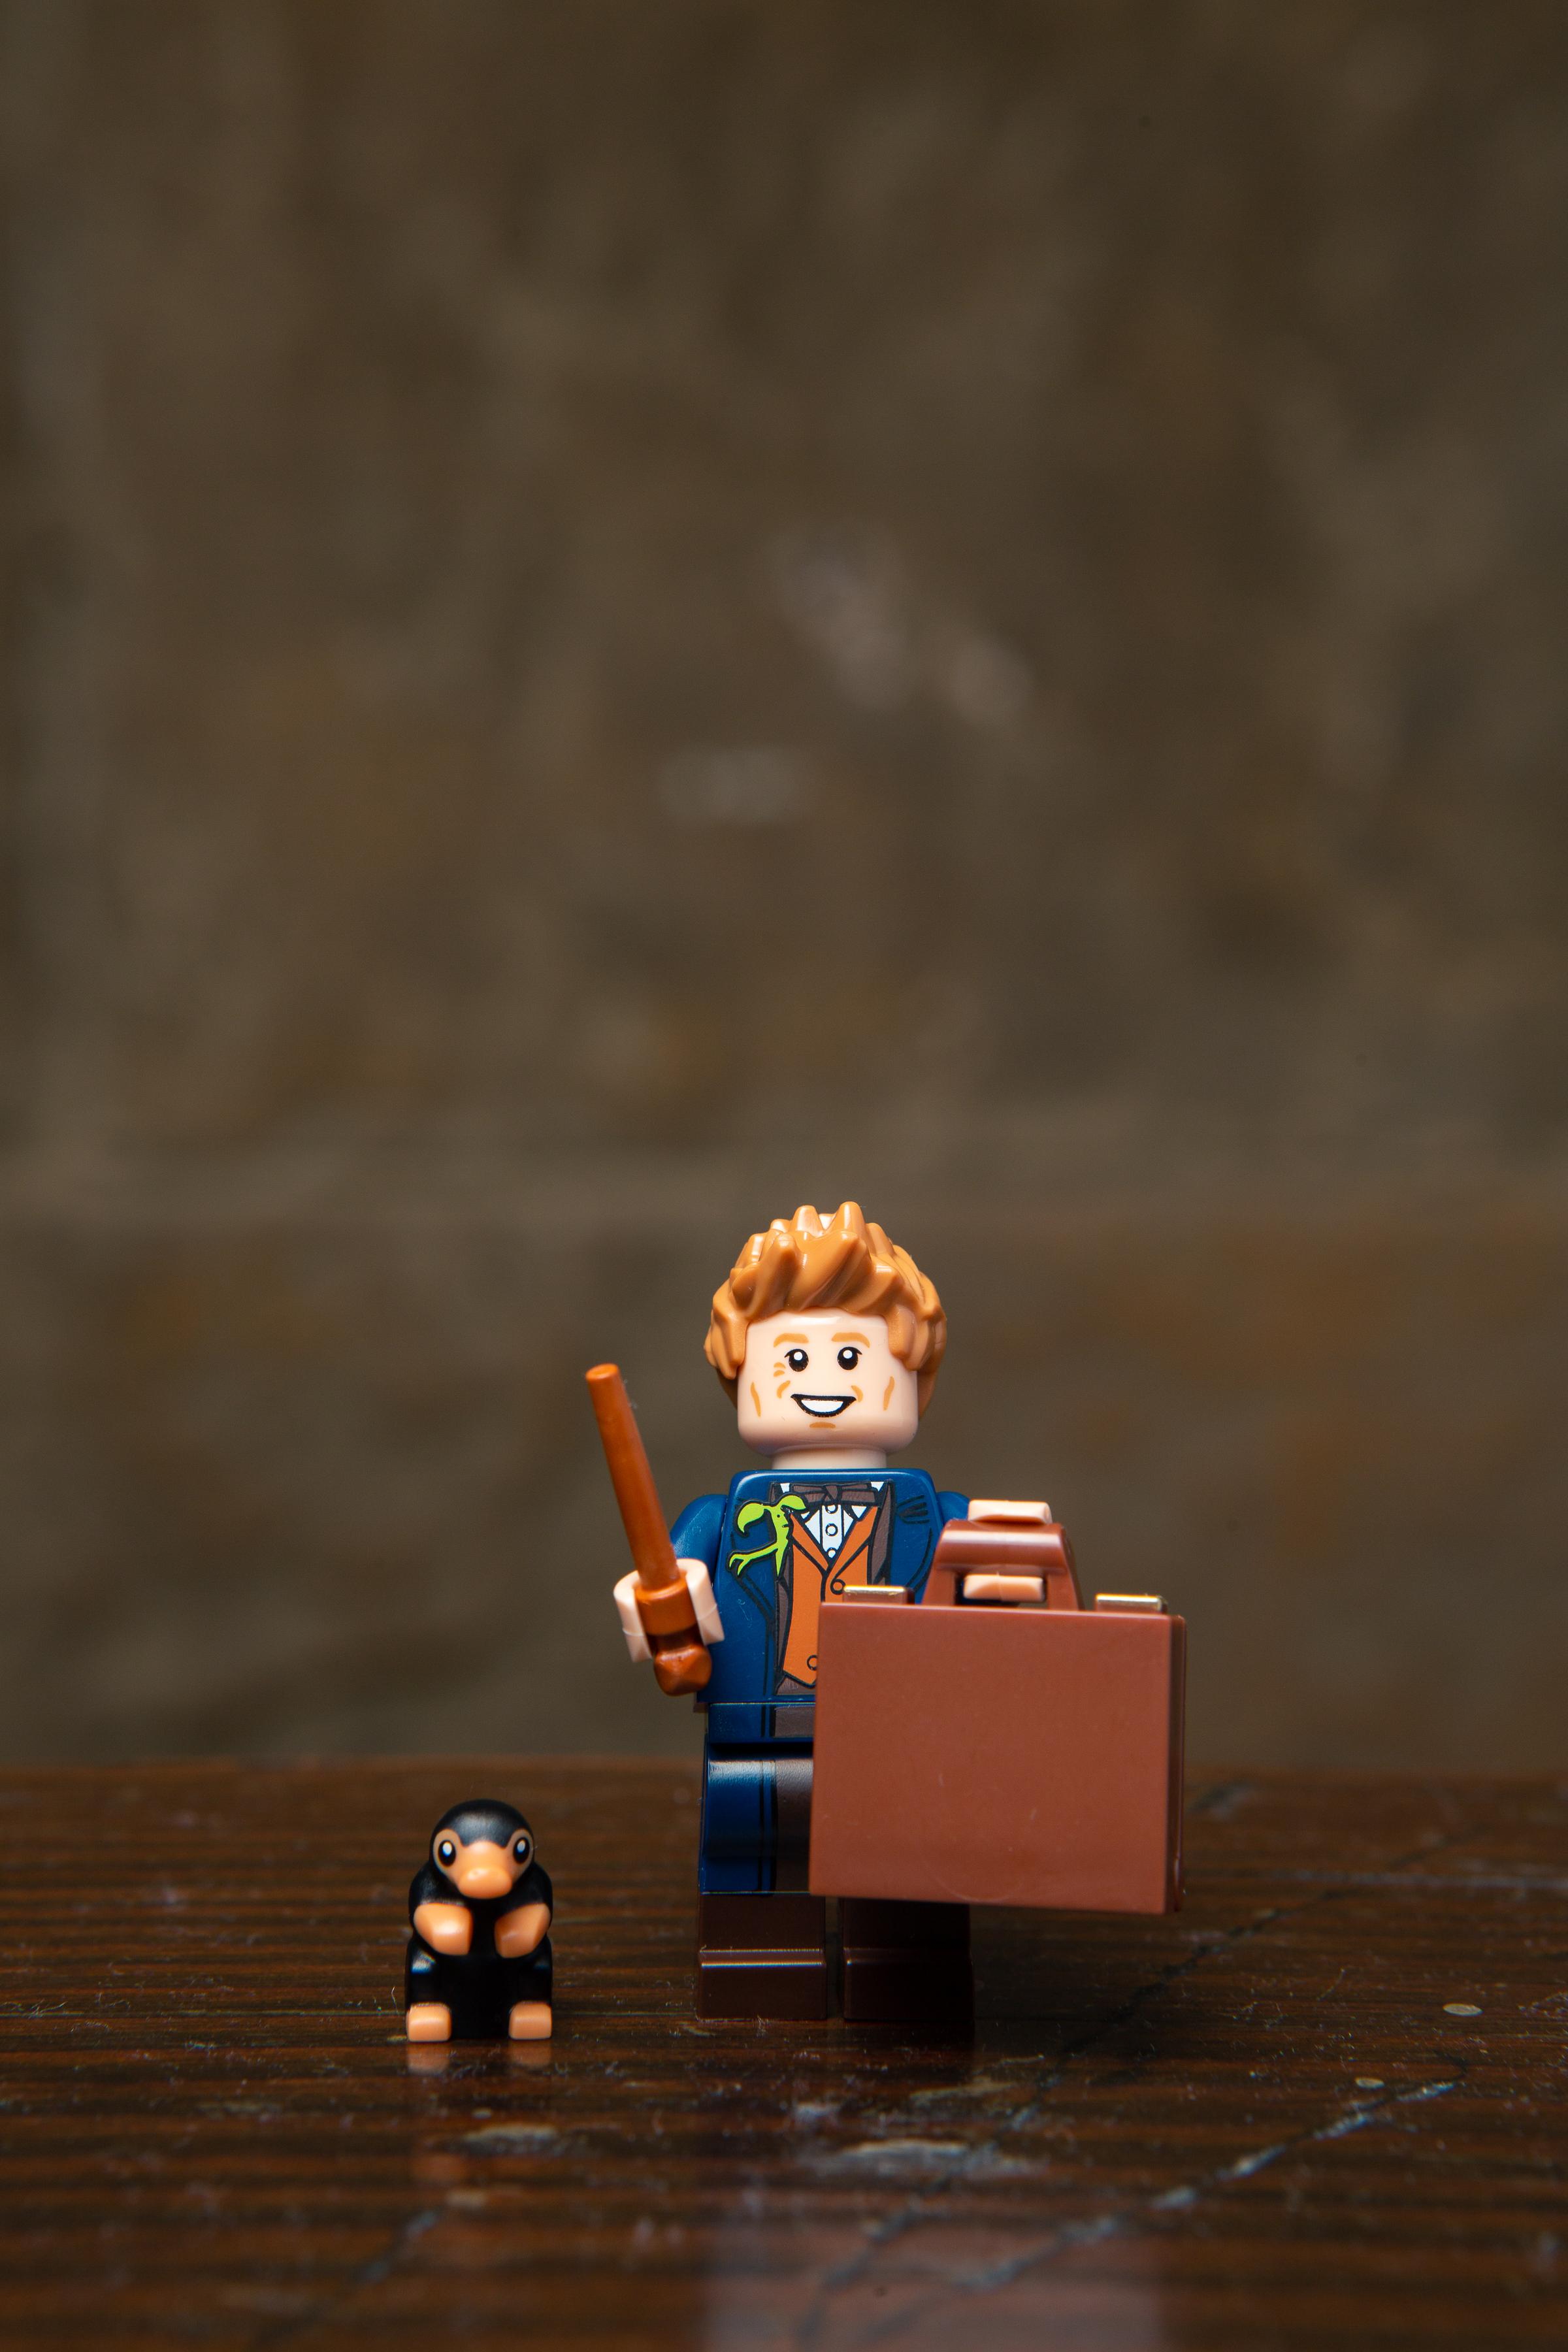 LEGO_WBST_19.06.18_hi-res-8.jpg